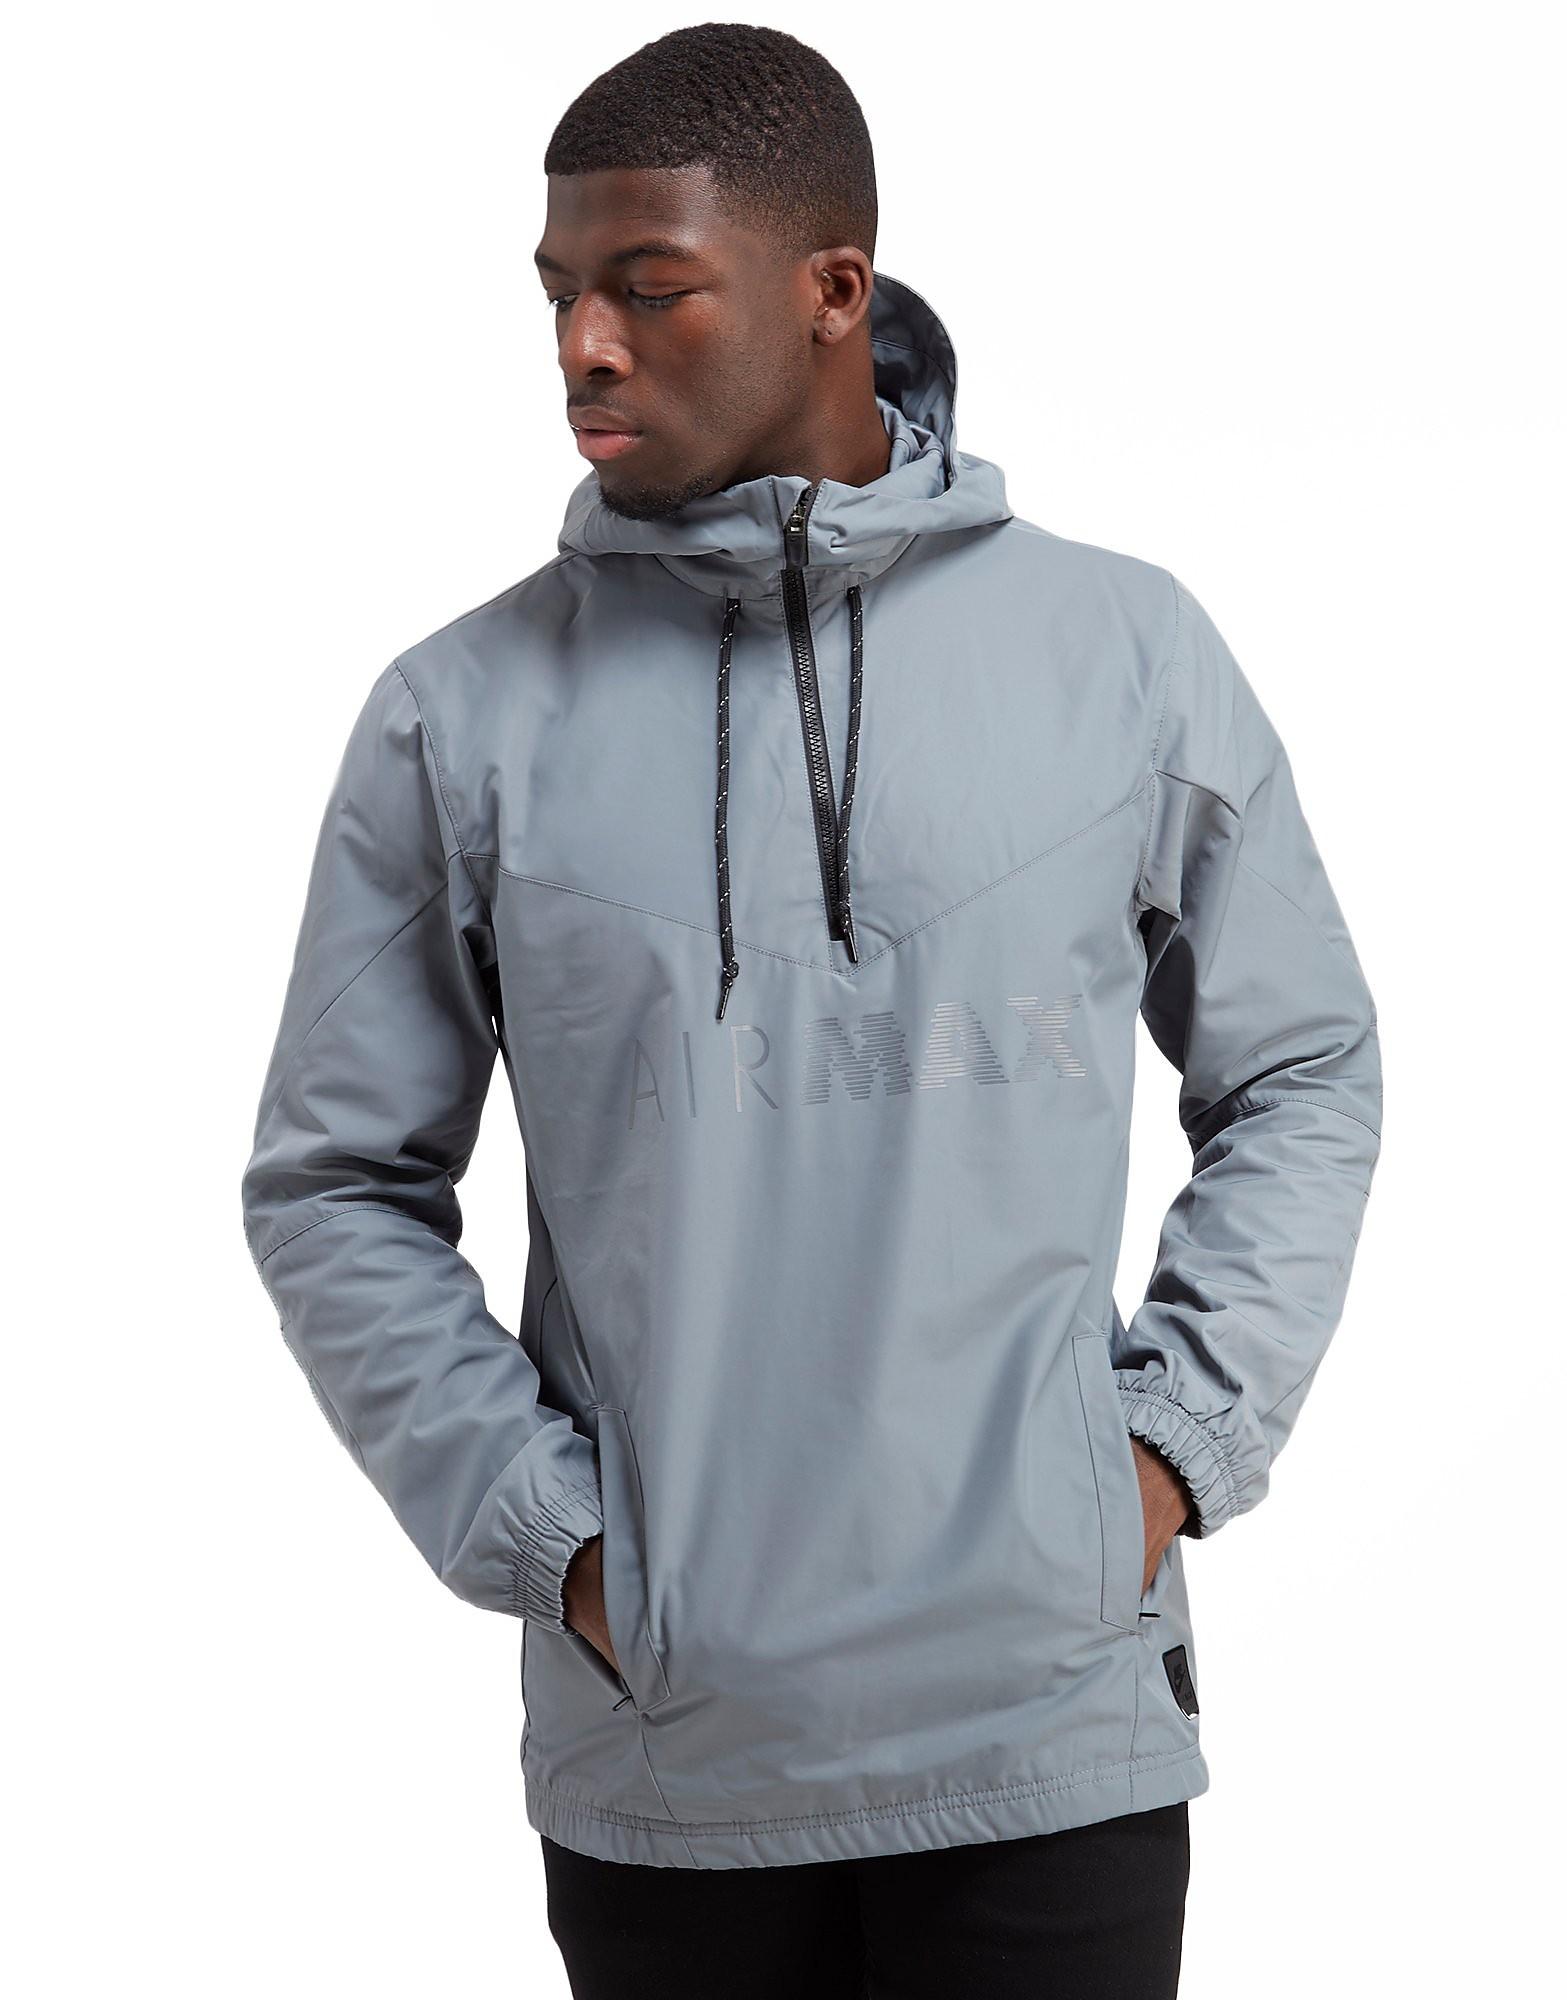 nike air max half zip chevron jacket grey mens. Black Bedroom Furniture Sets. Home Design Ideas